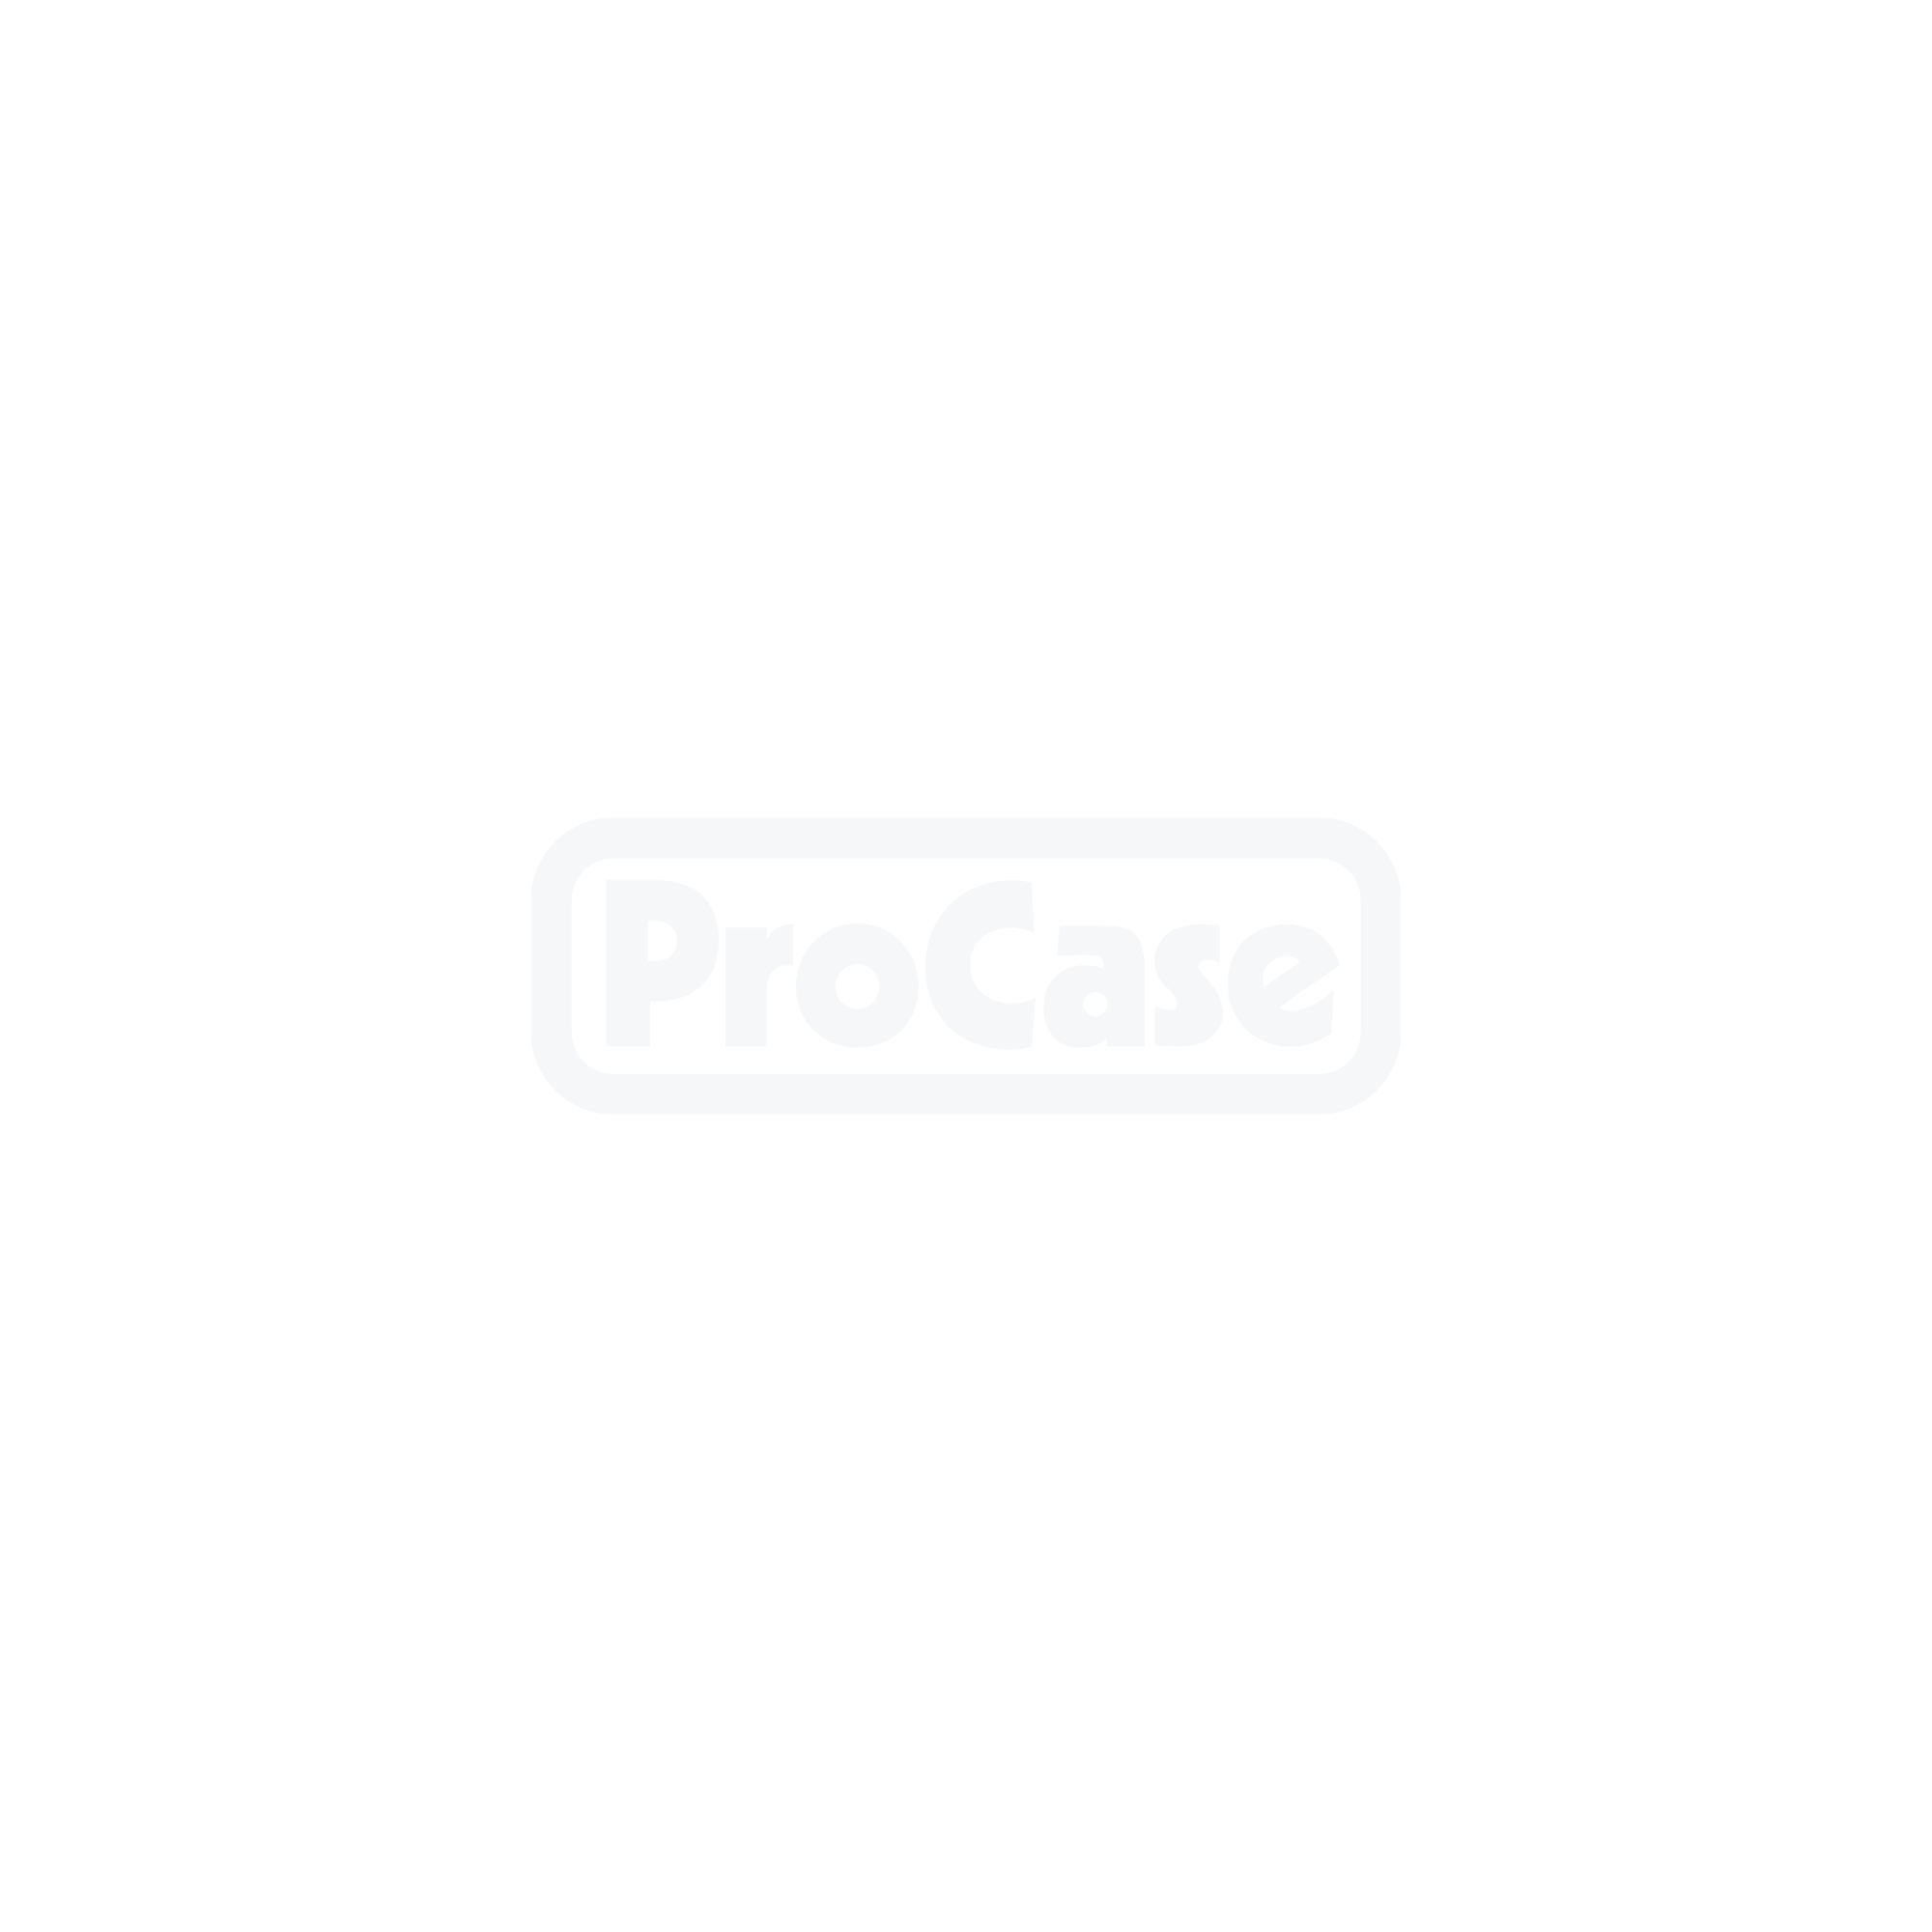 Mixercase für Blackmagic ATEM 1 M/E Advanced Panel / Camera Control Panel 2